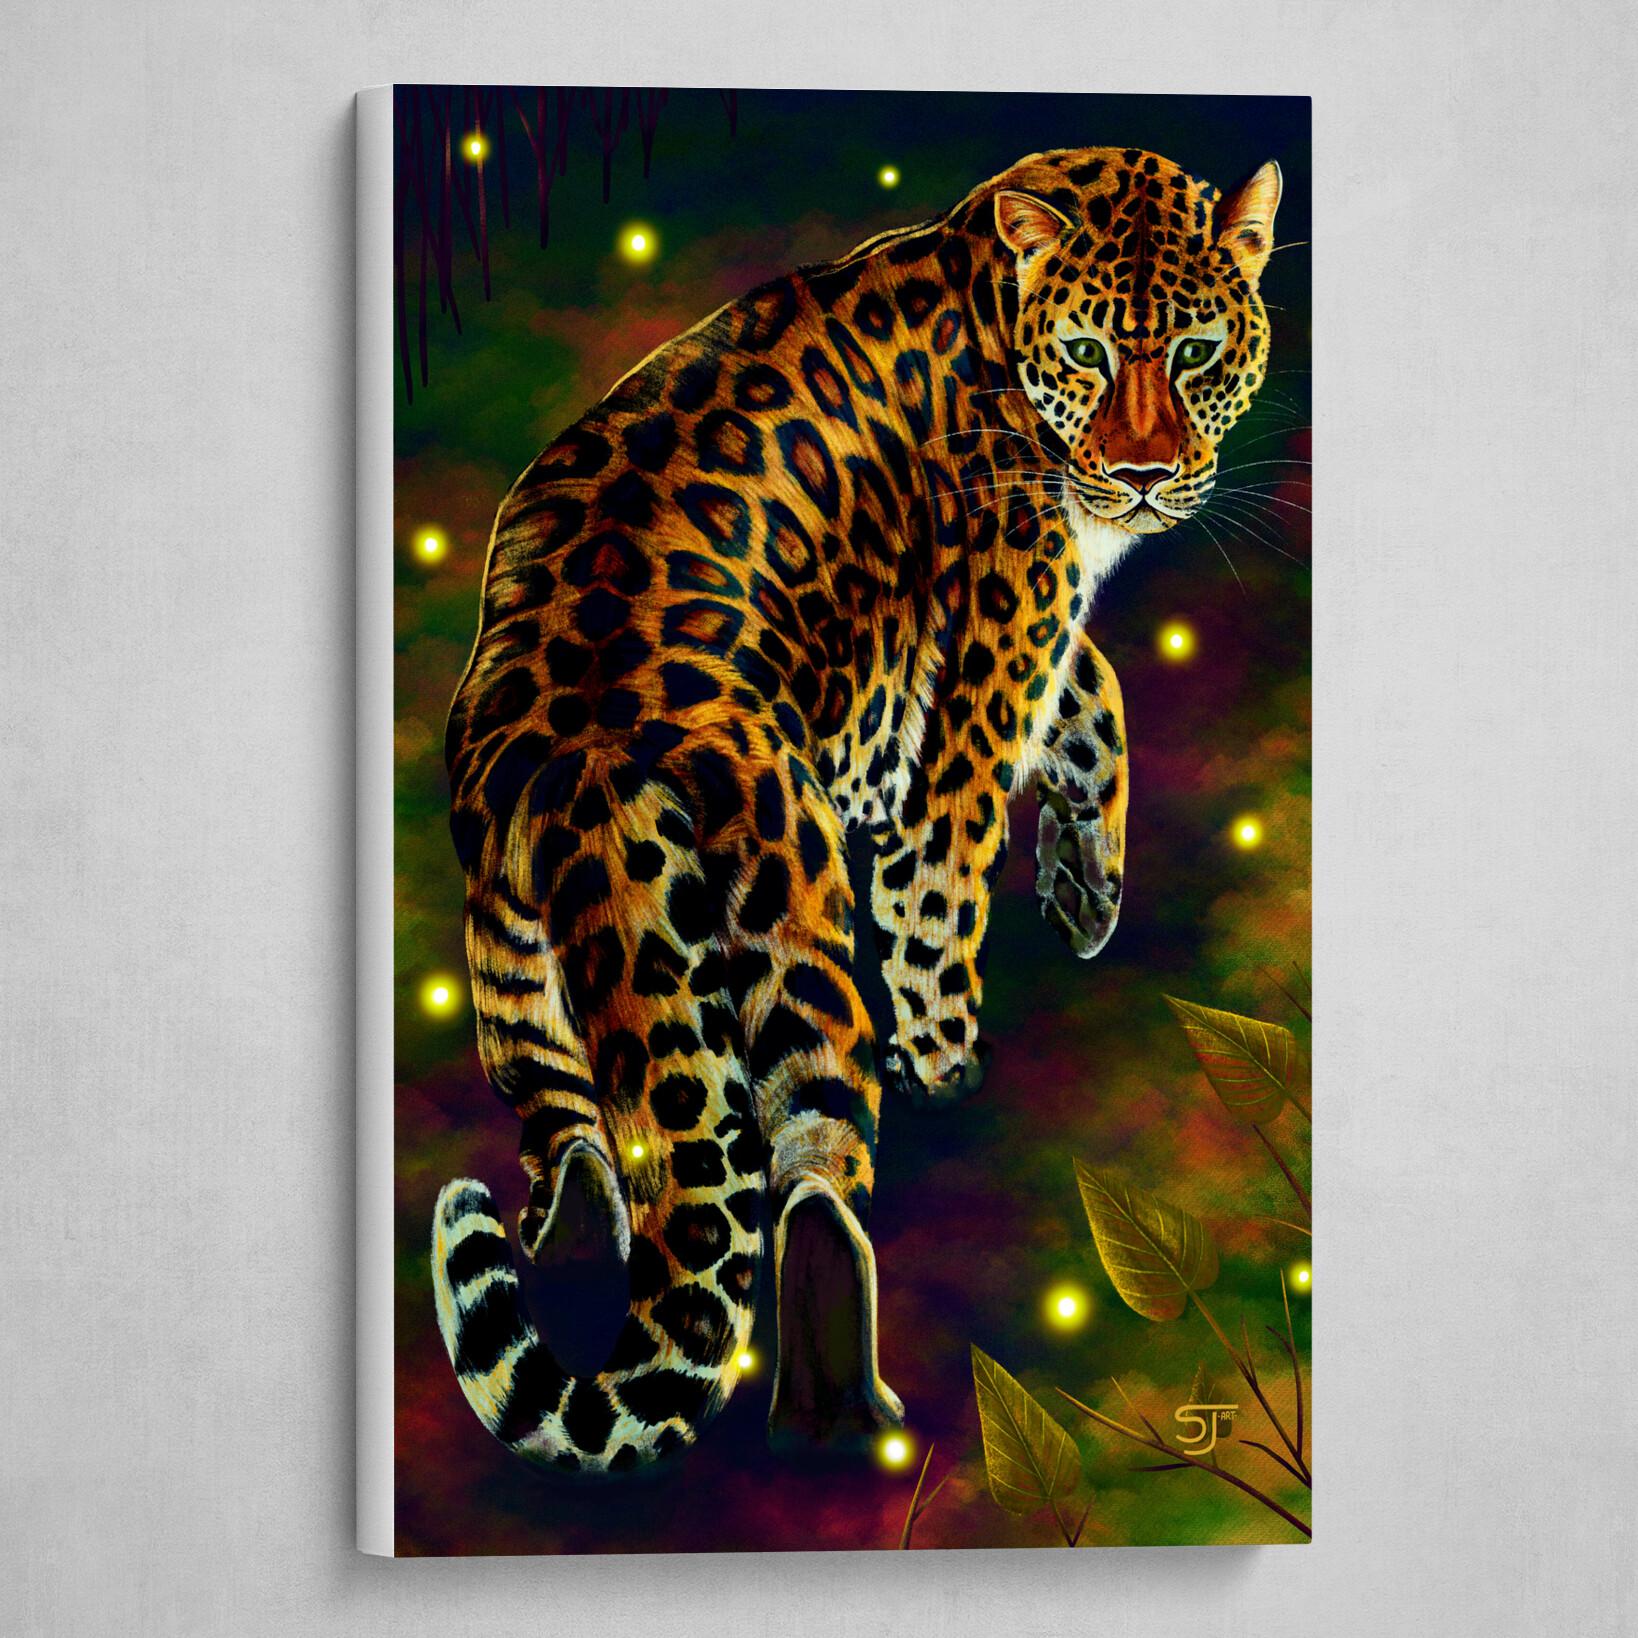 A Curious Amur Leopard